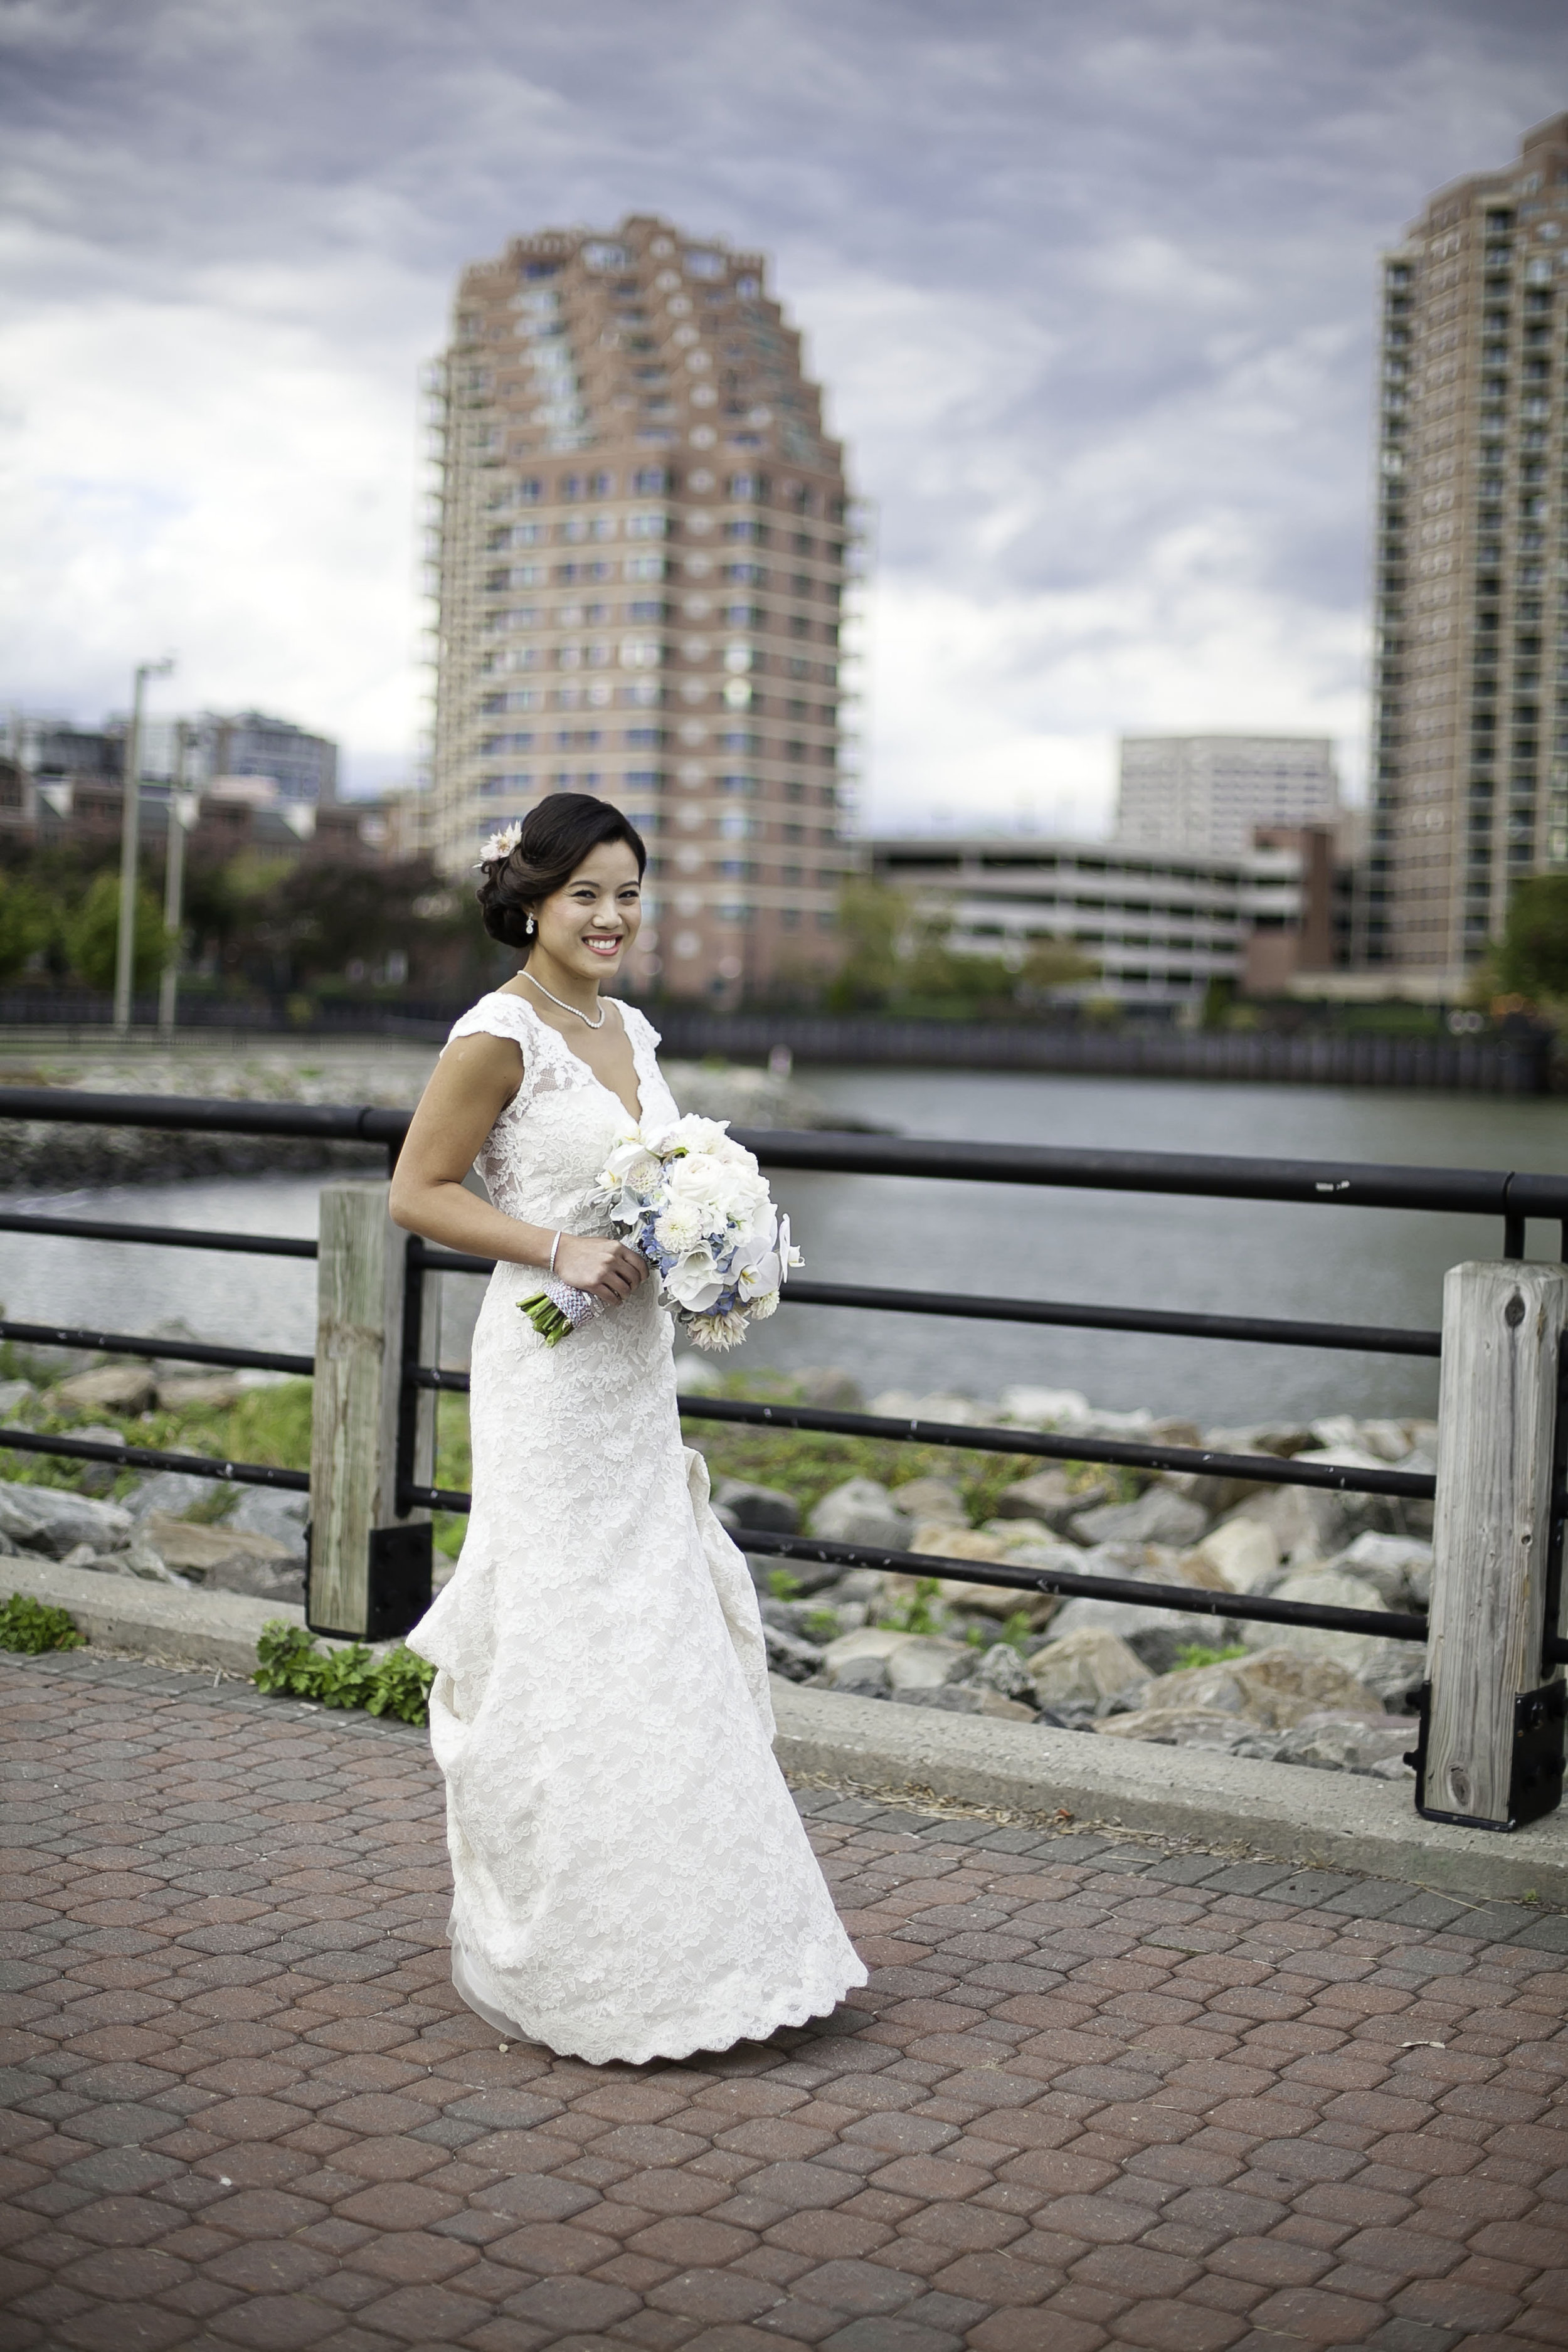 Courtney Calvin s Wedding 10 8 14-1court and cal wedding day-0388.jpg